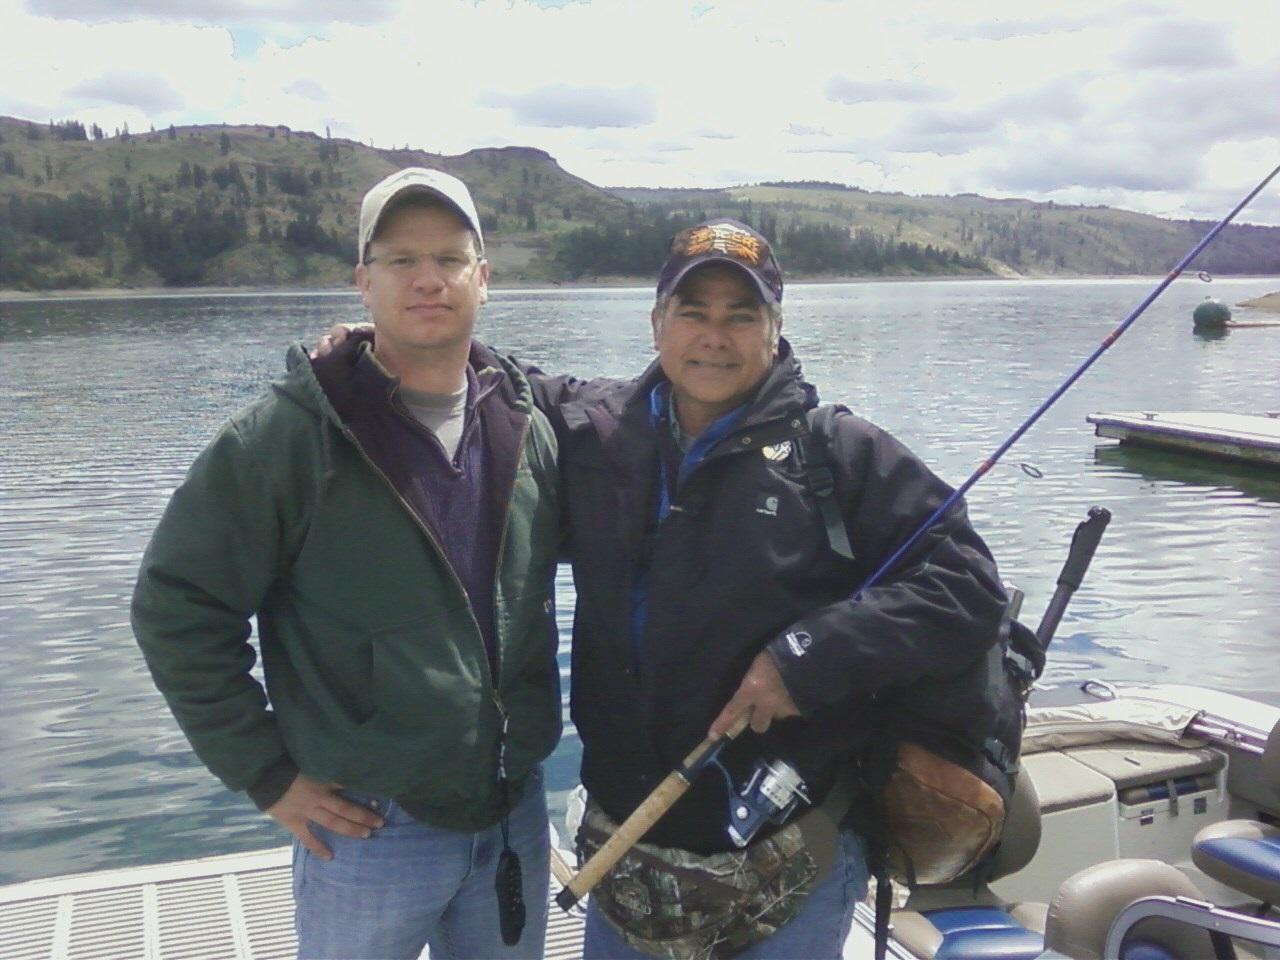 KHQ Meteorologist Dave Law and Spokane Walleye Club Member Greg at Porcupine Bay on Lake Roosevelt.